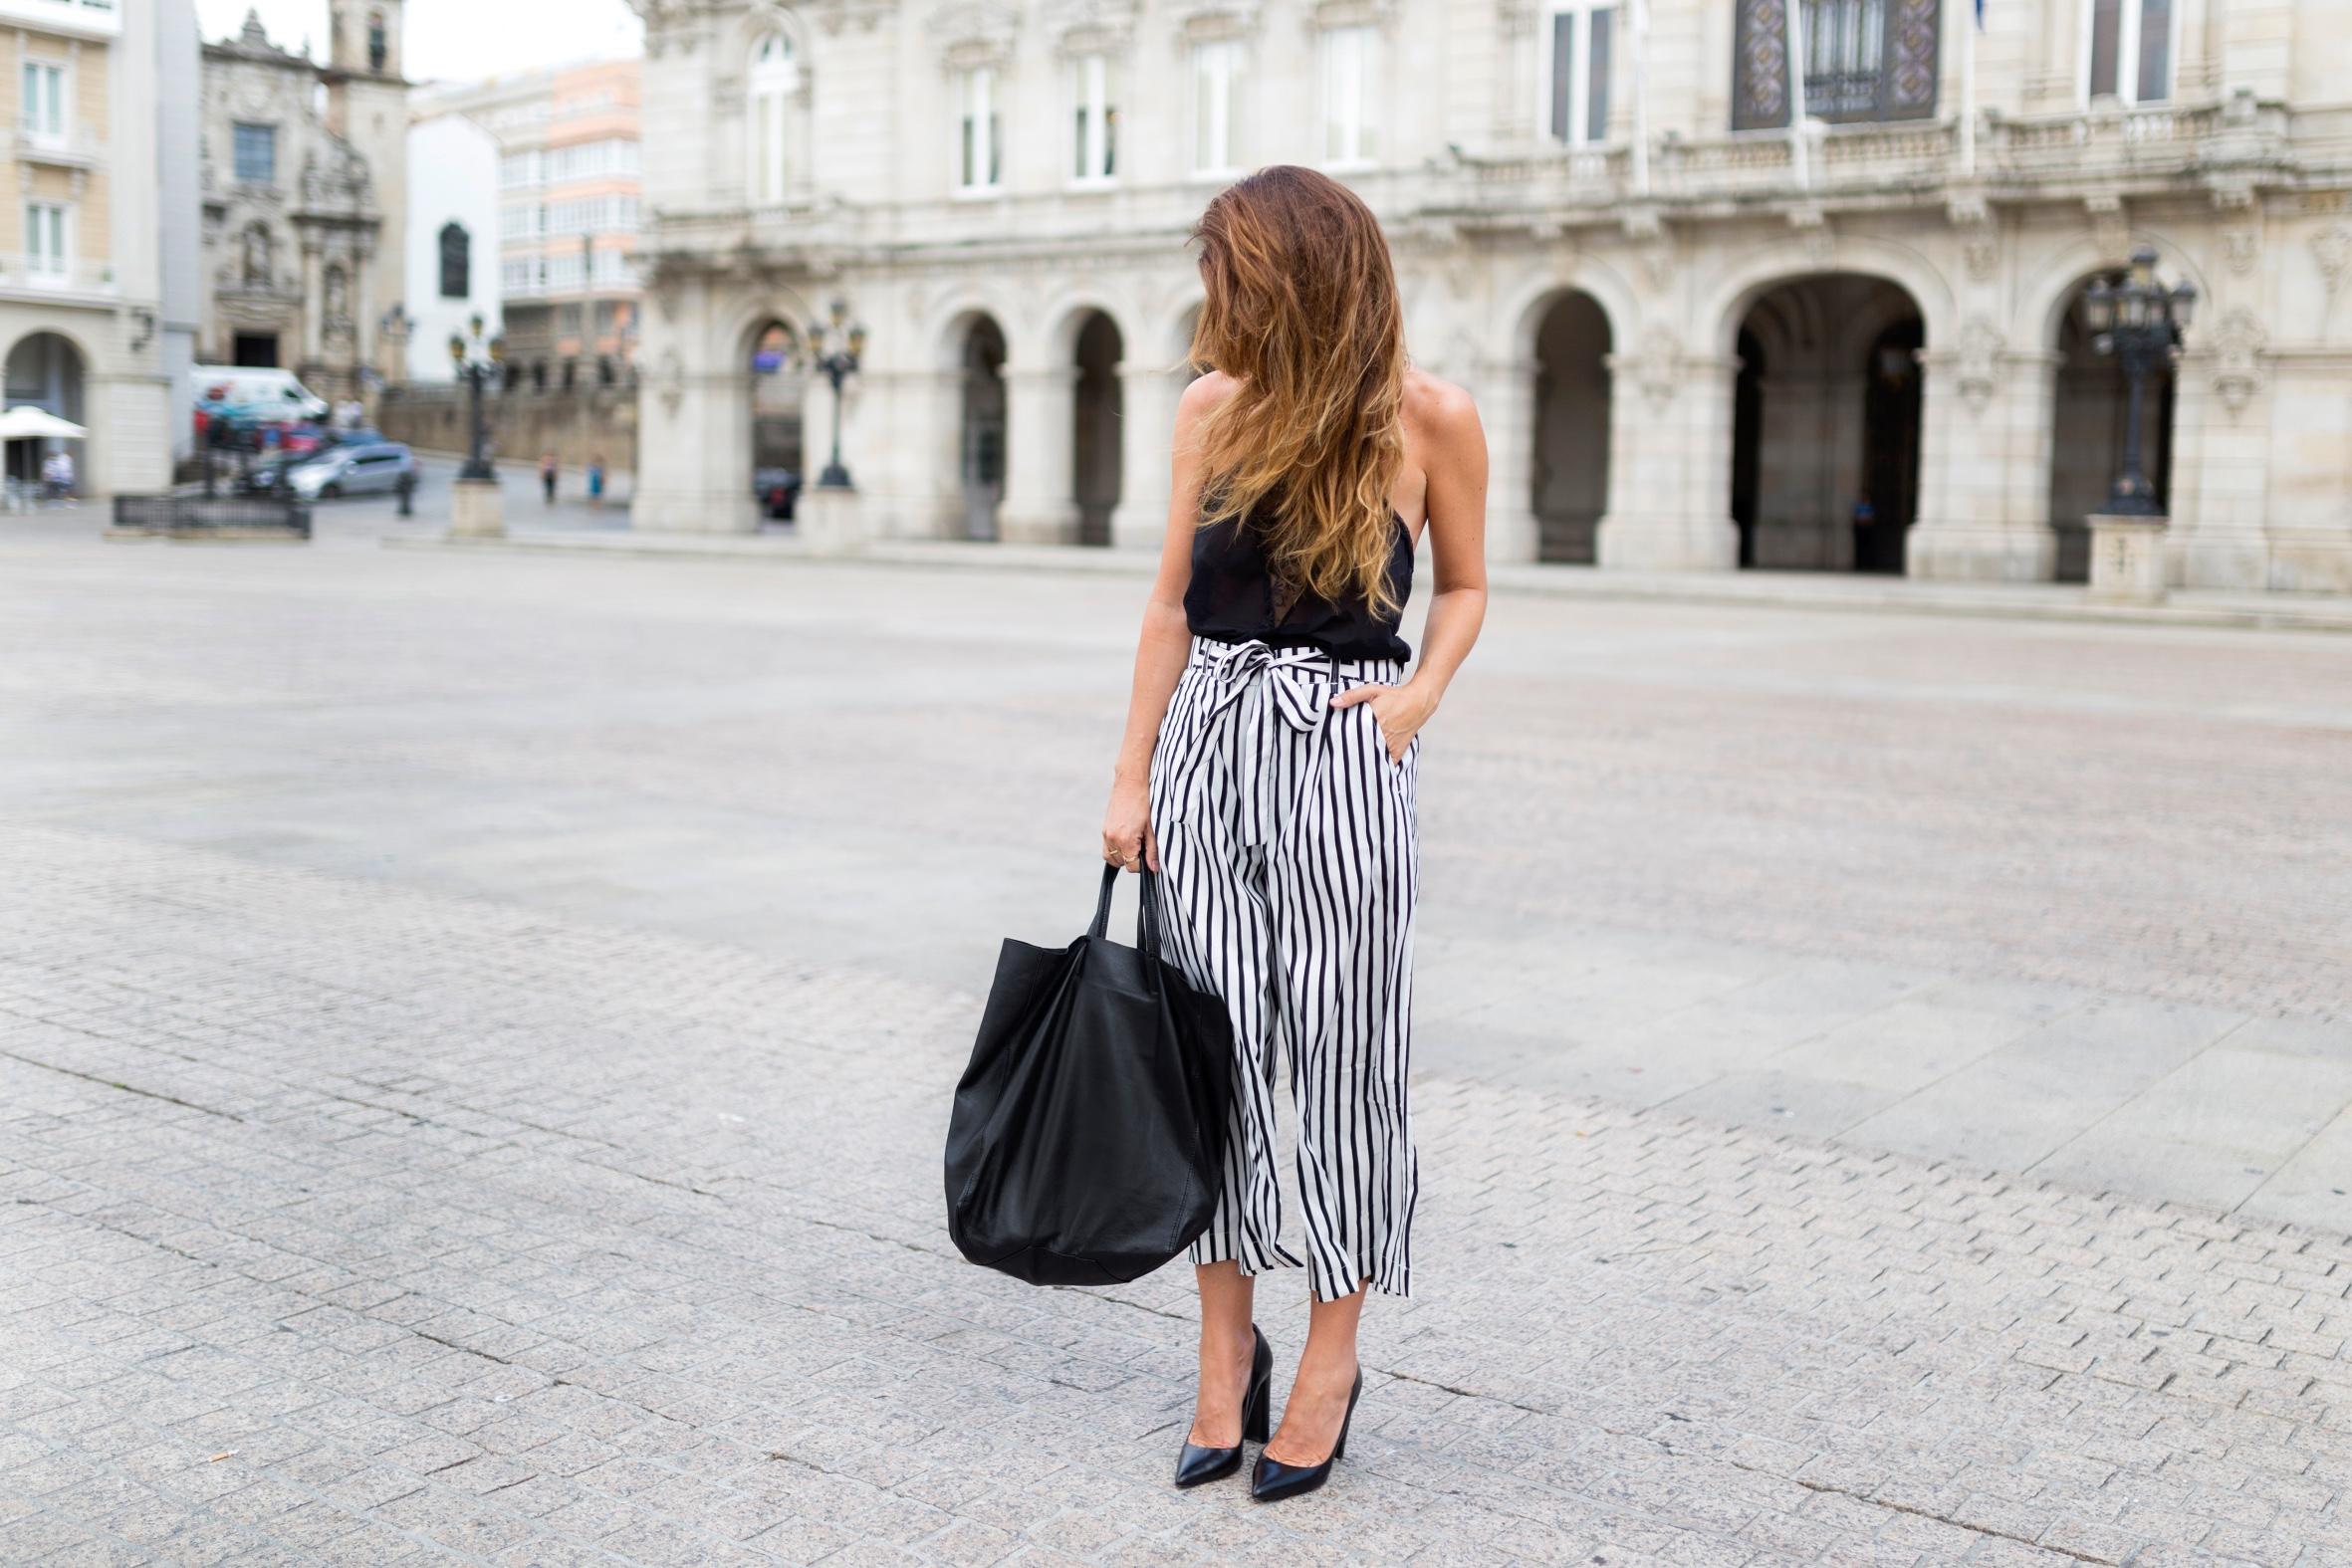 moda-fashion-volver a la rutina- Passionata- lencería- mono lencero- streetstyle- coruña- Céline bag- blogger-passionatagirls- Cèline-tote bag